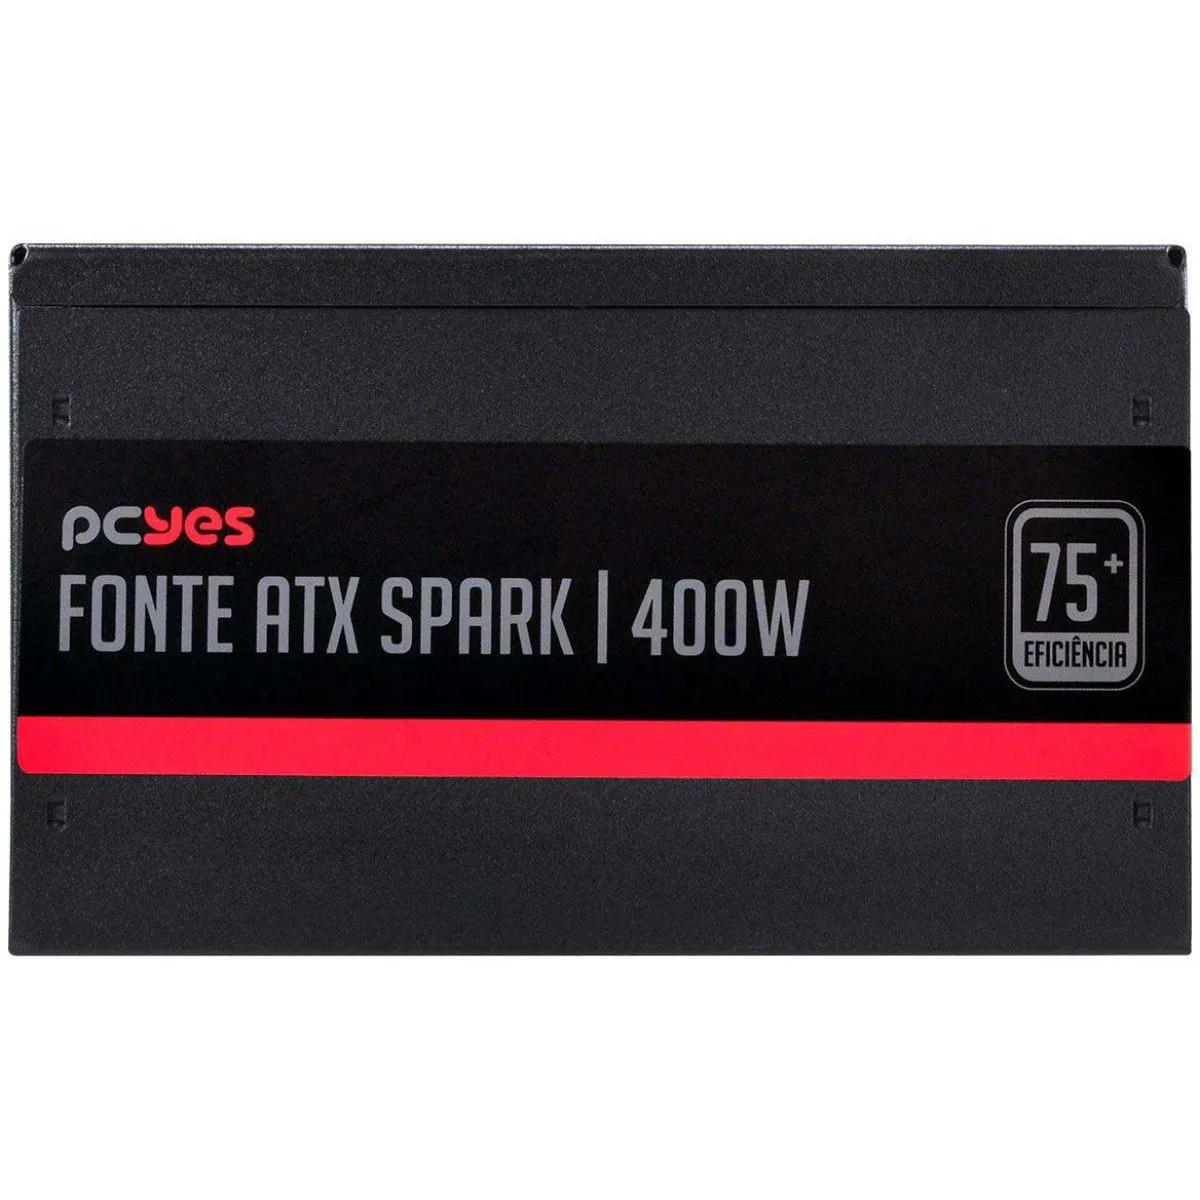 Fonte PcYes 400W 75+ Eficiência PCF Ativo Spark PXSP400WPT